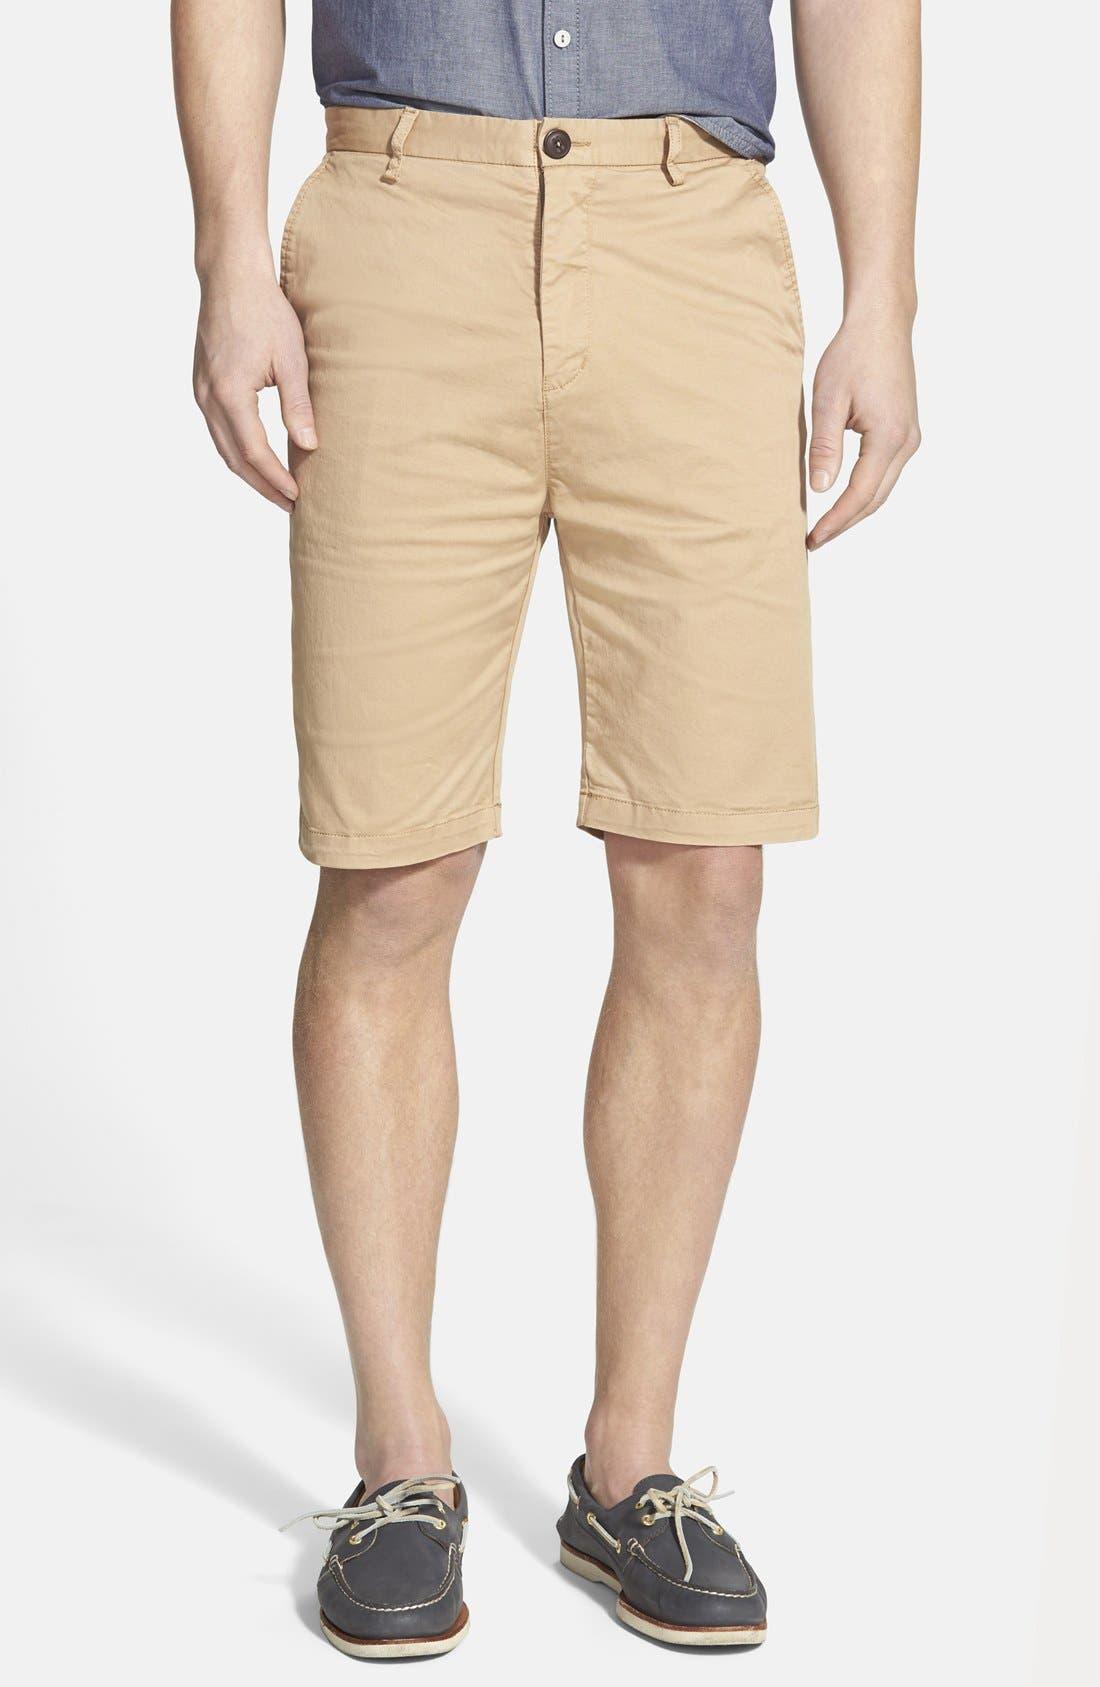 Rodd & Gunn 'Penrose' Flat Front Shorts